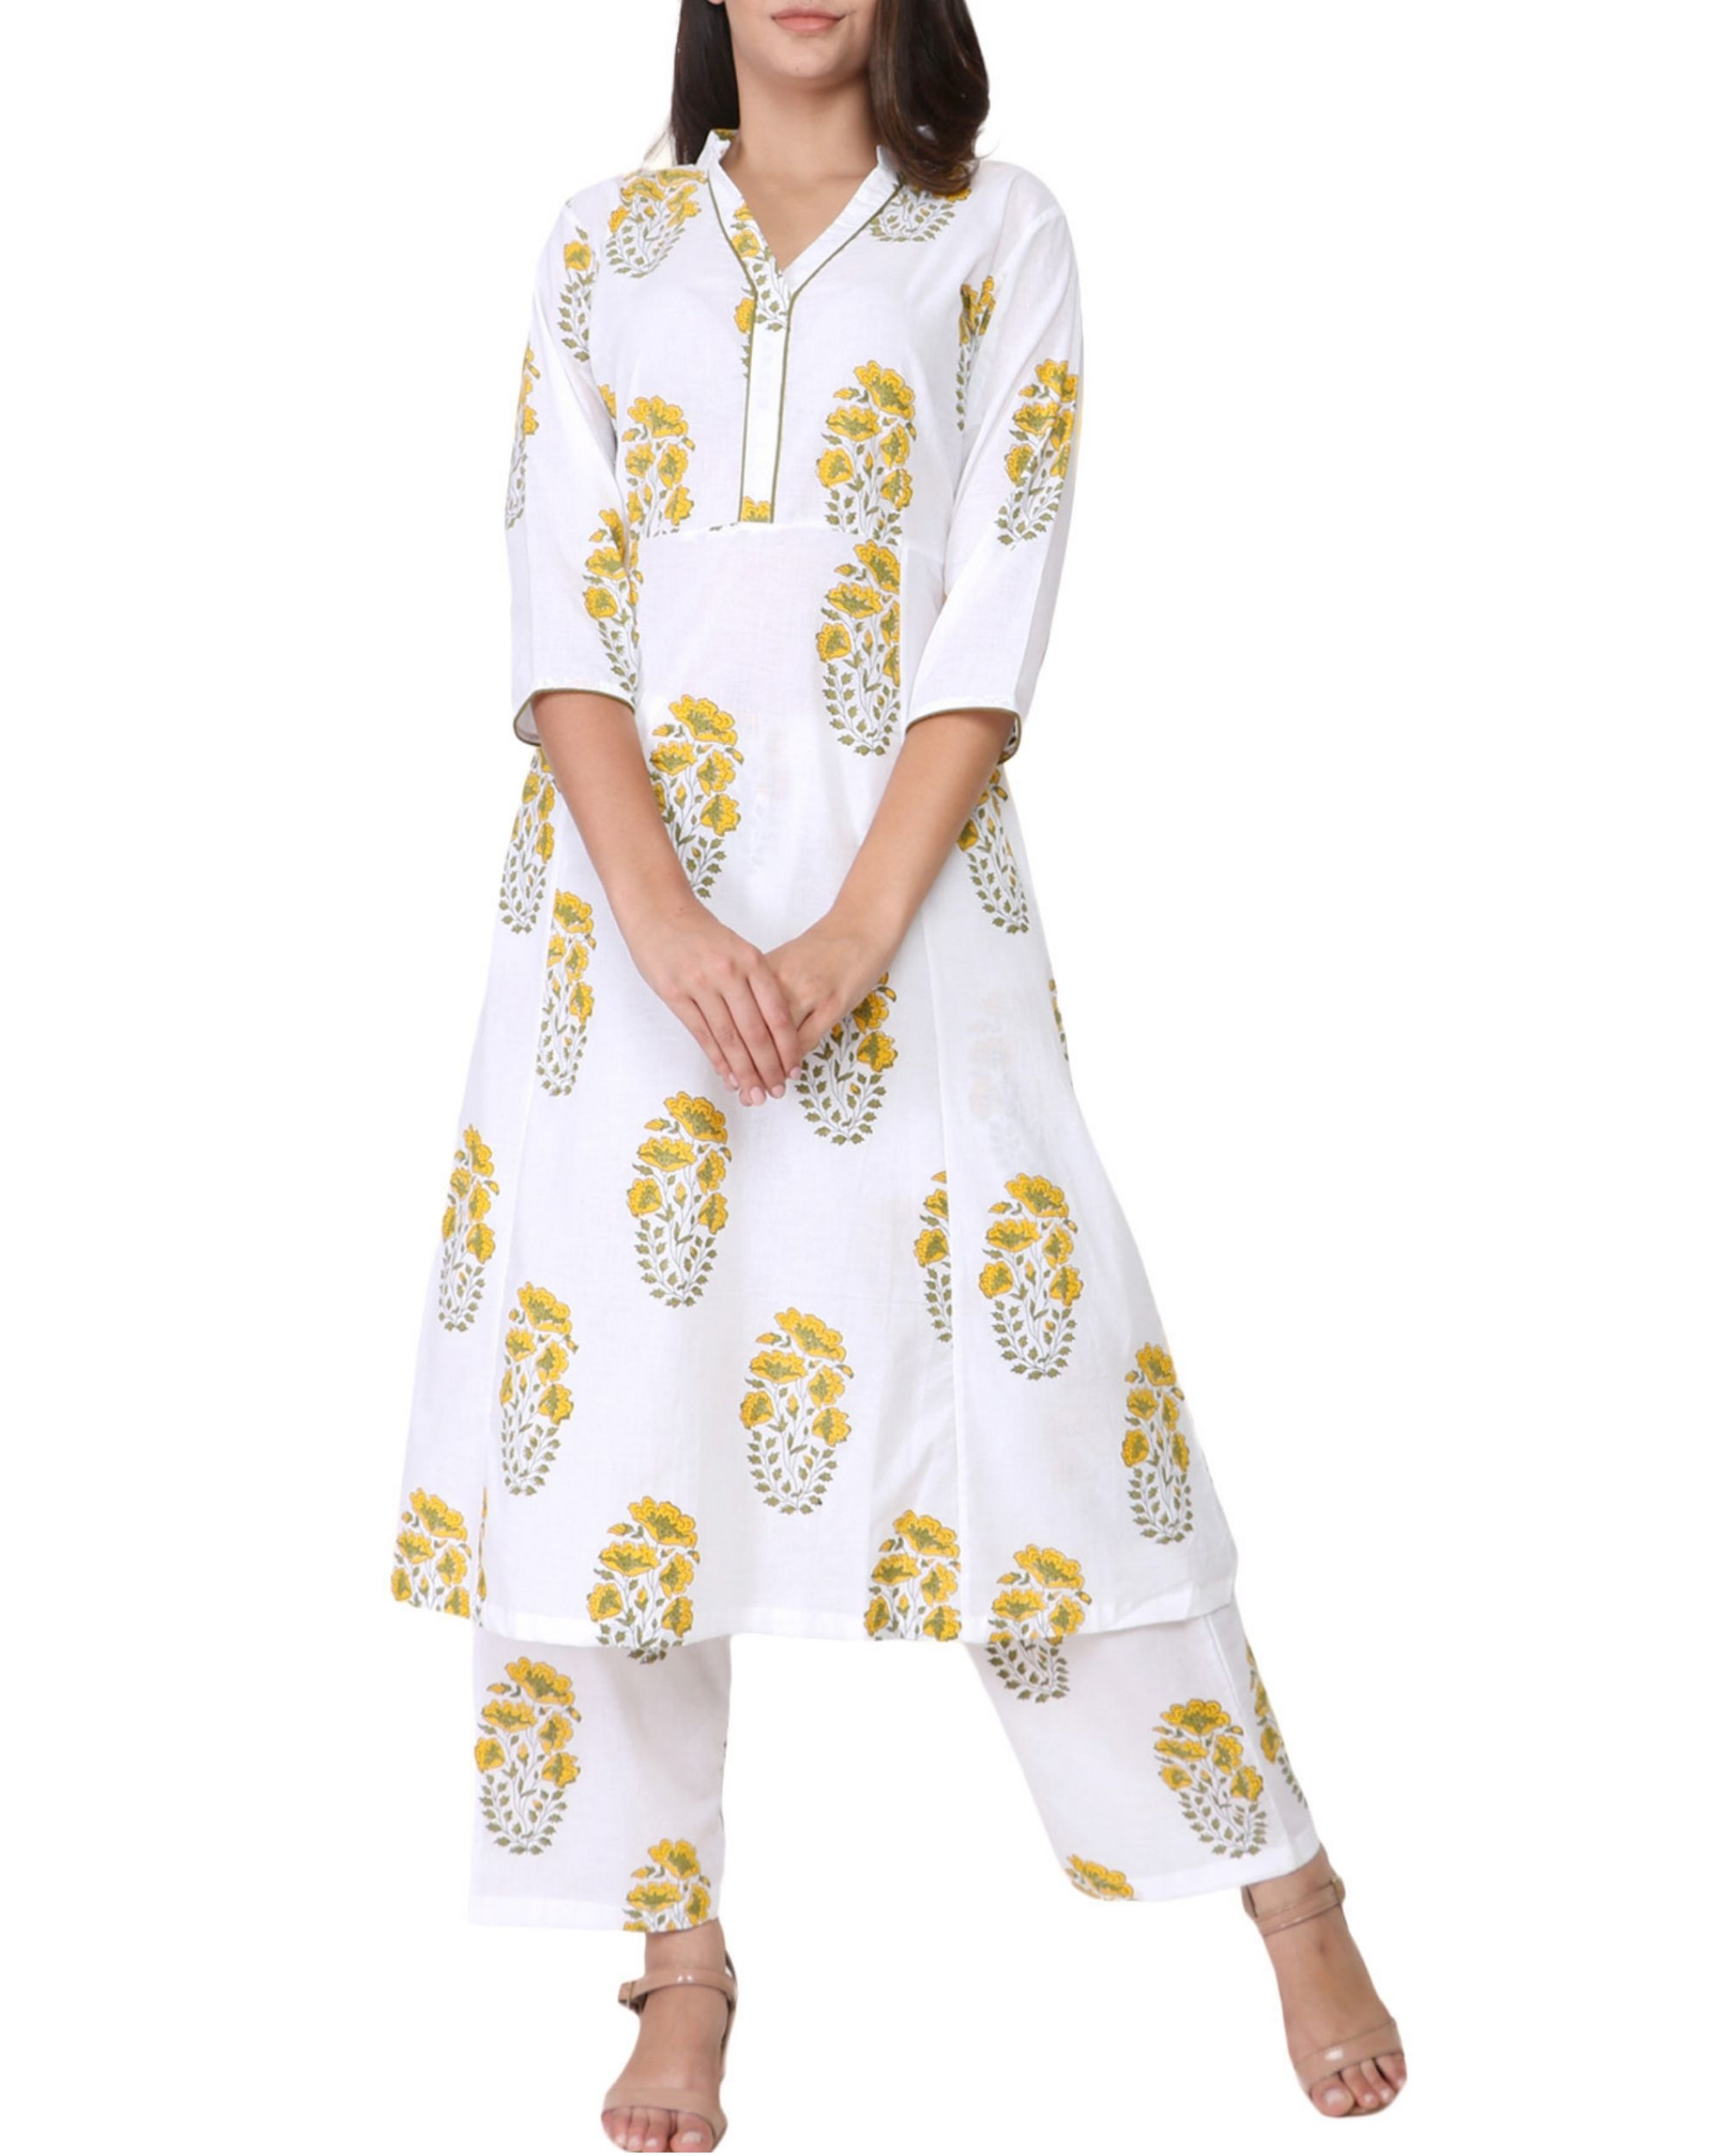 Mustard yellow and green floral print cotton kurta set - set of two